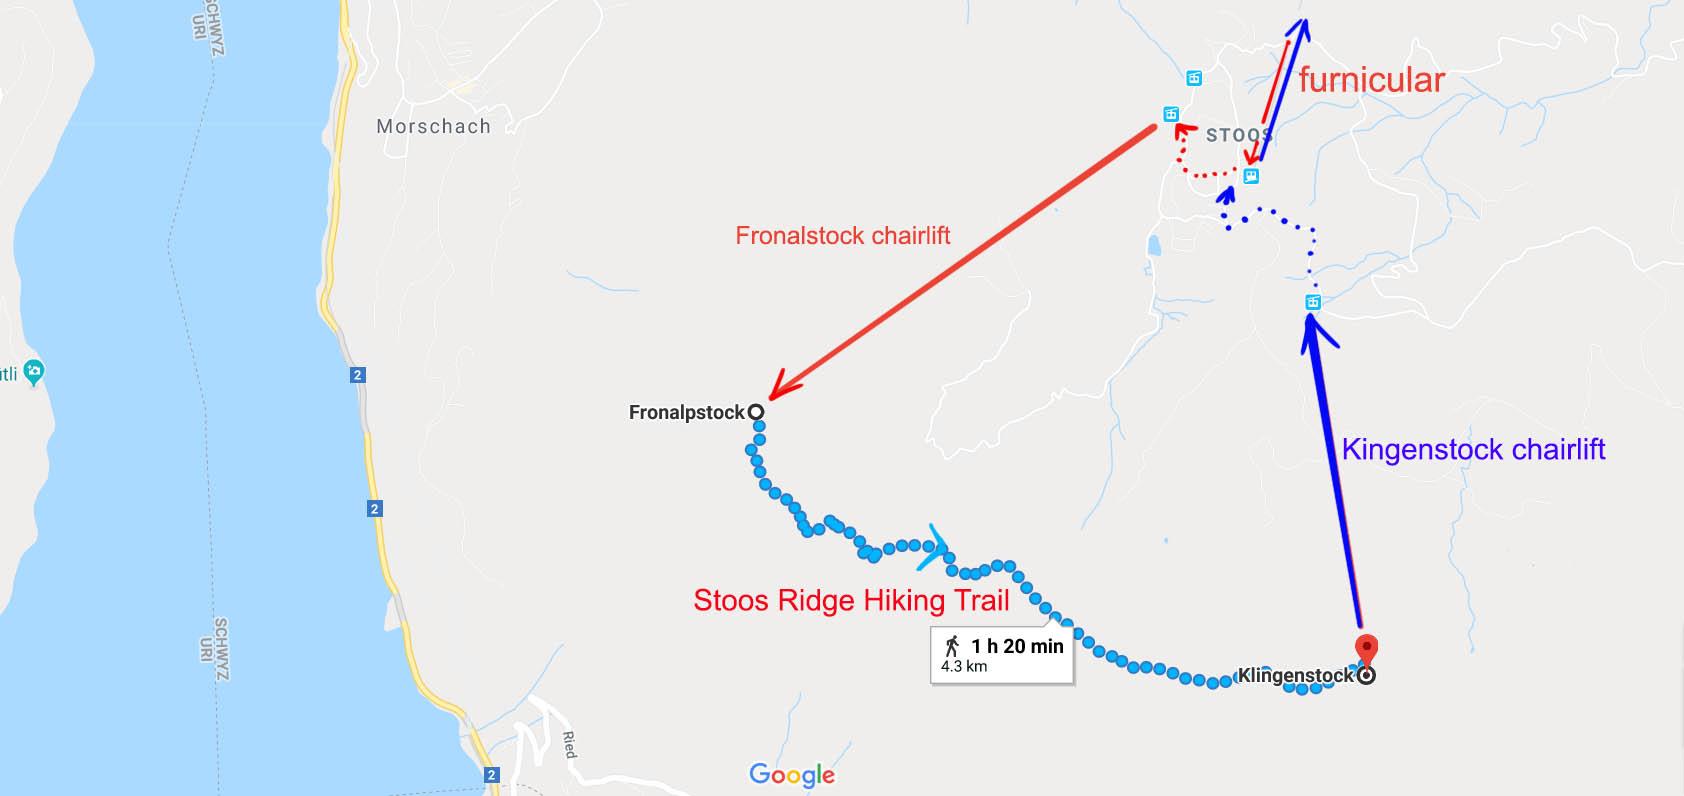 Stoos Ridge Hiking Trail